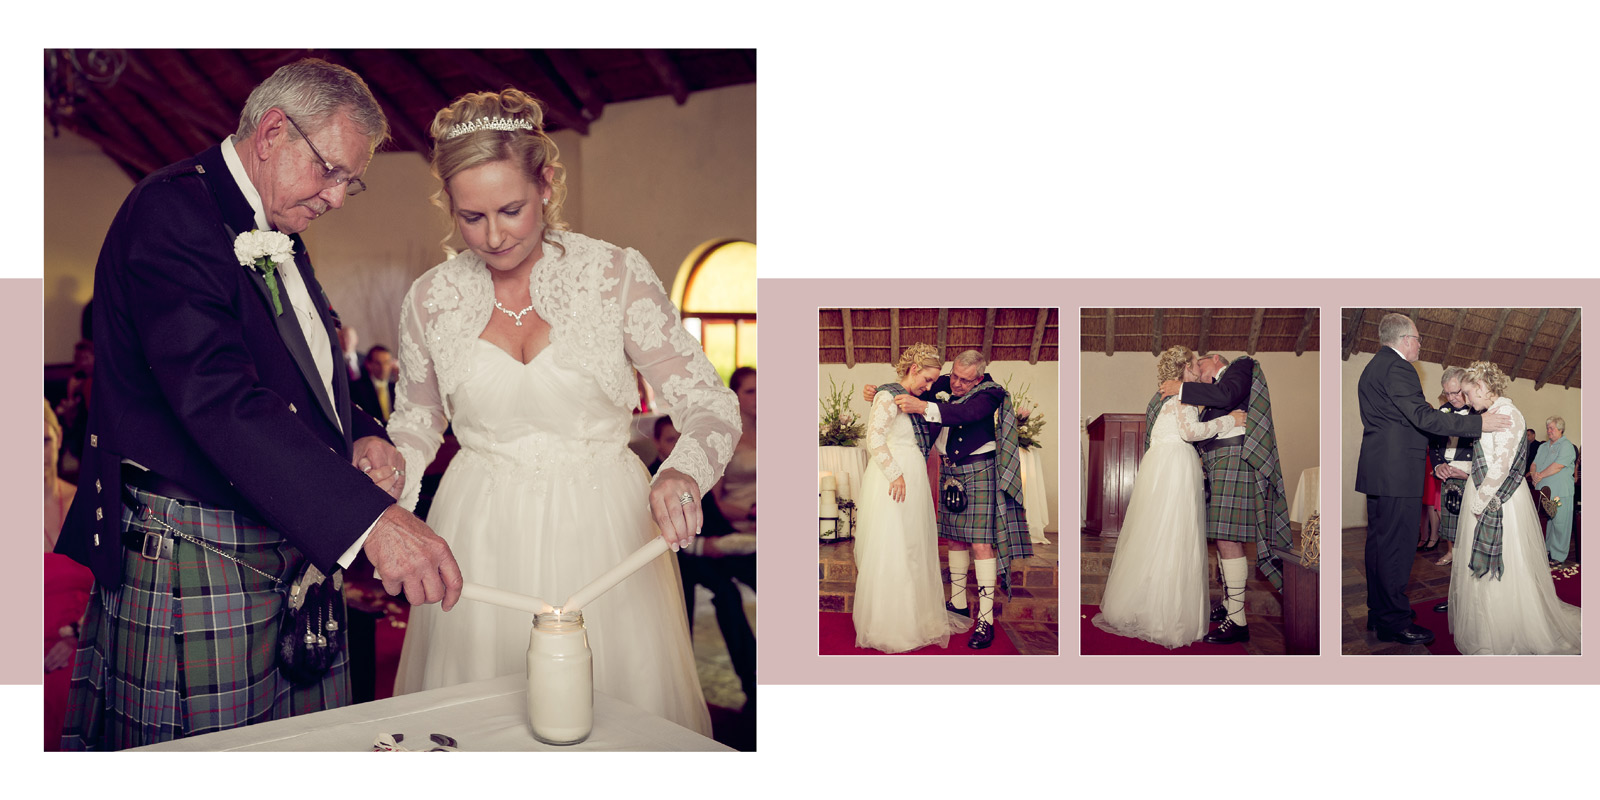 Nathalie Boucry Photography | Deidre and Lister Wedding Album 012